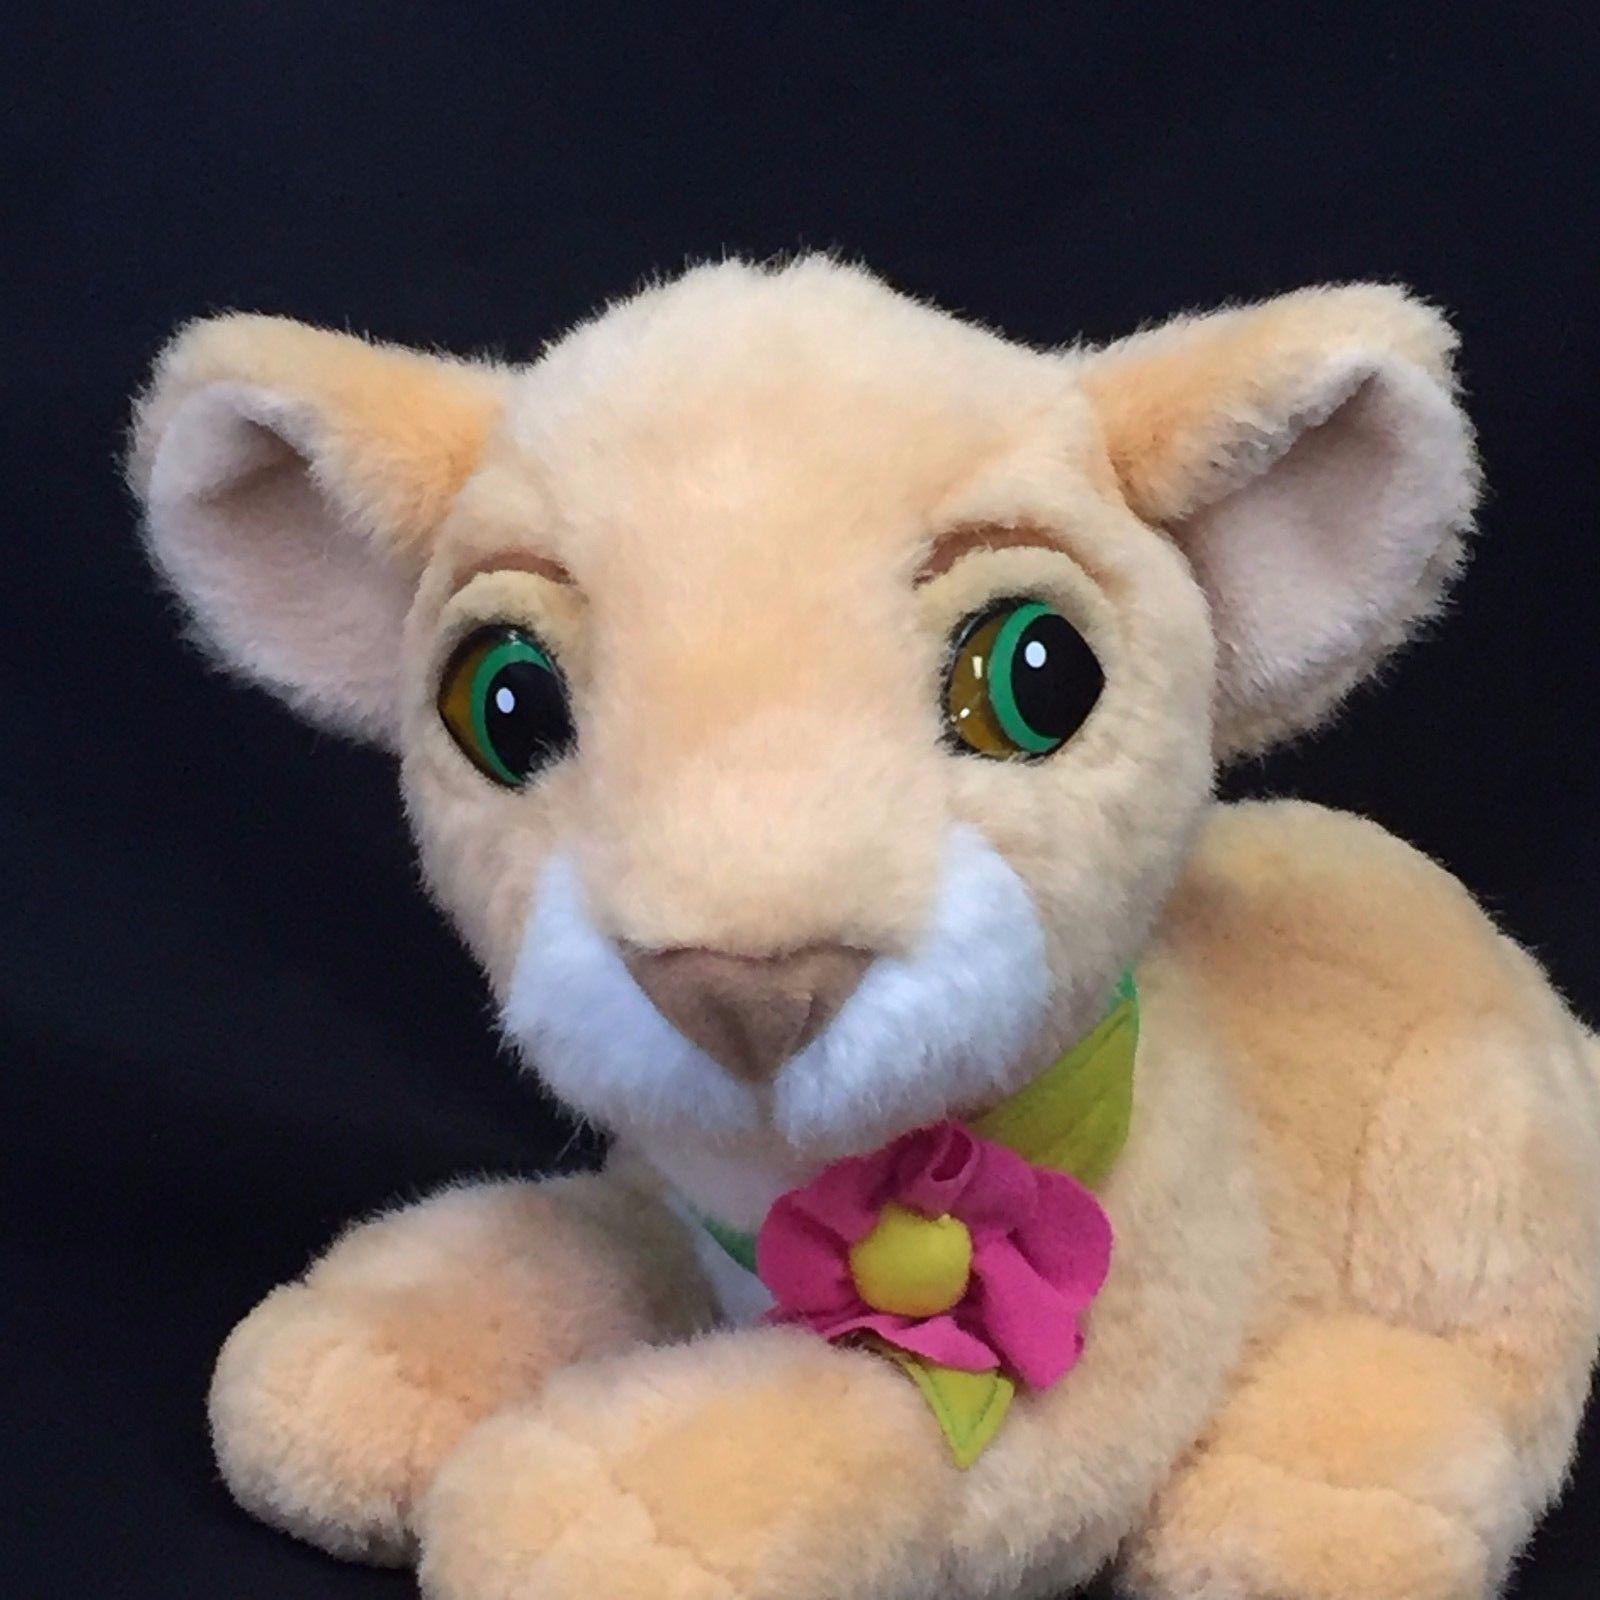 Disney Mattel The Lion King Purring Nala Baby Cub Plush